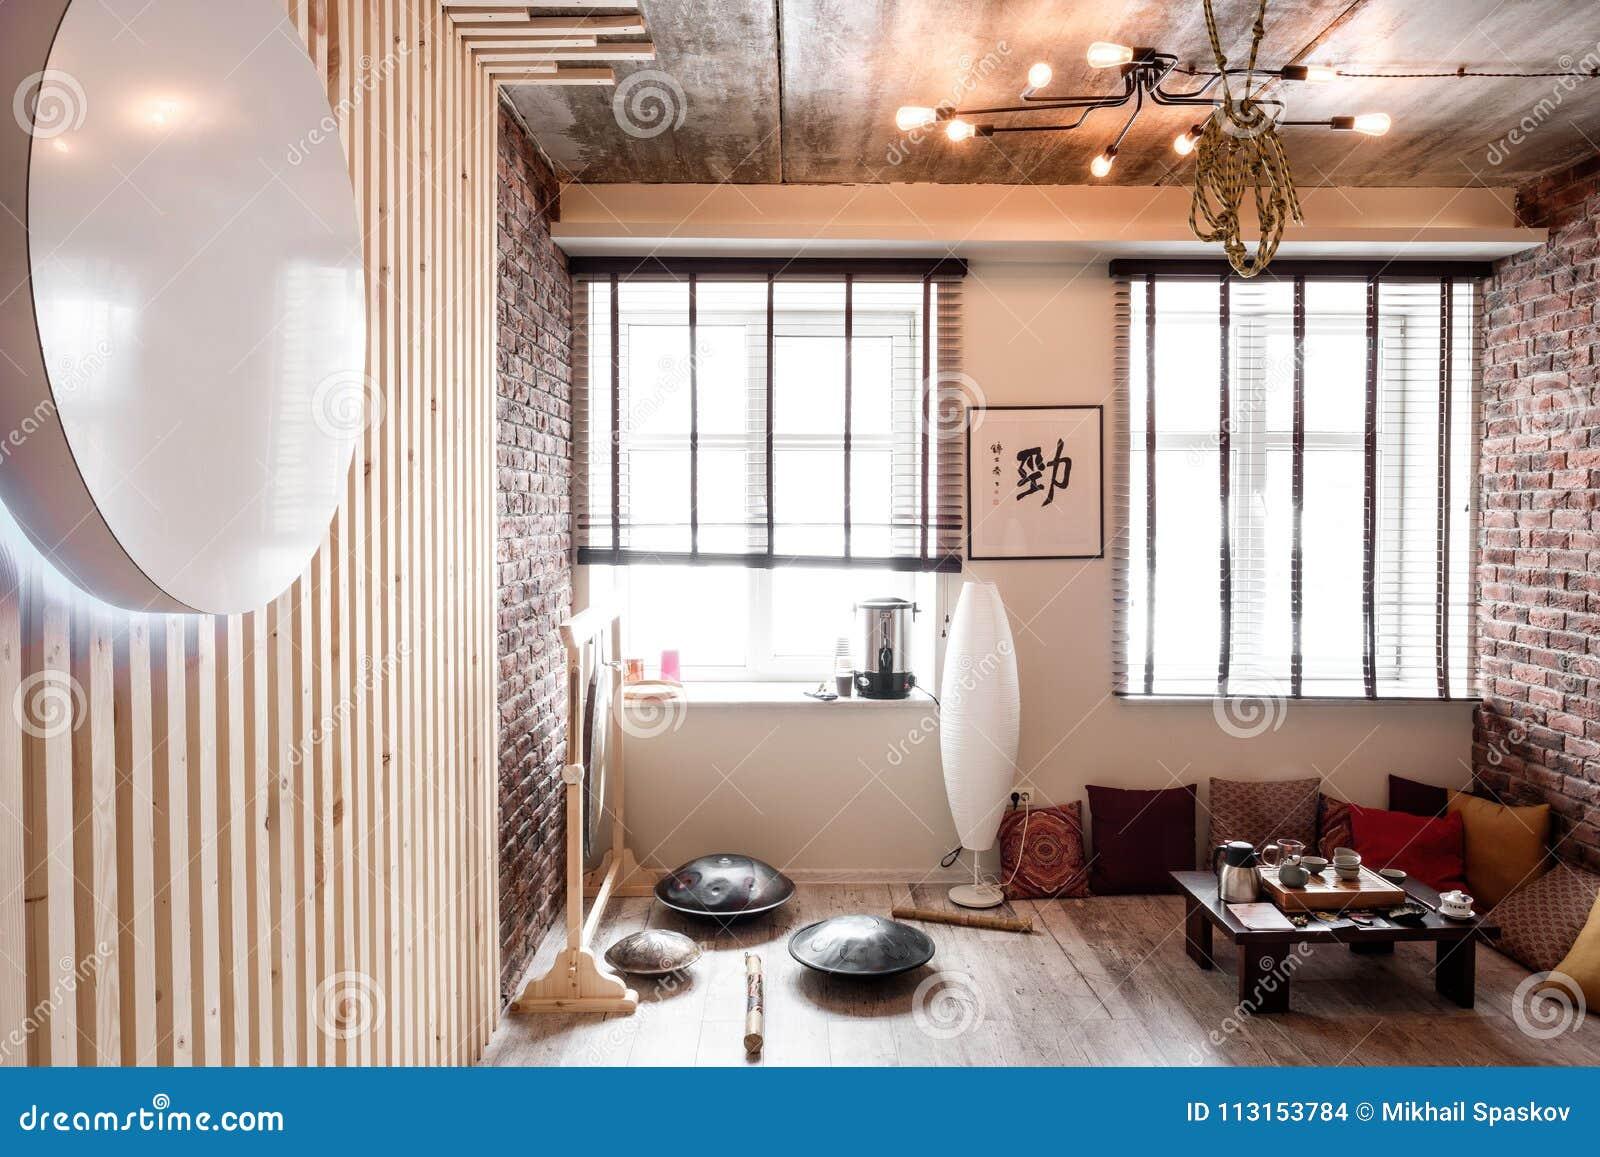 Rustic cabin flooring design decoration ideas loft